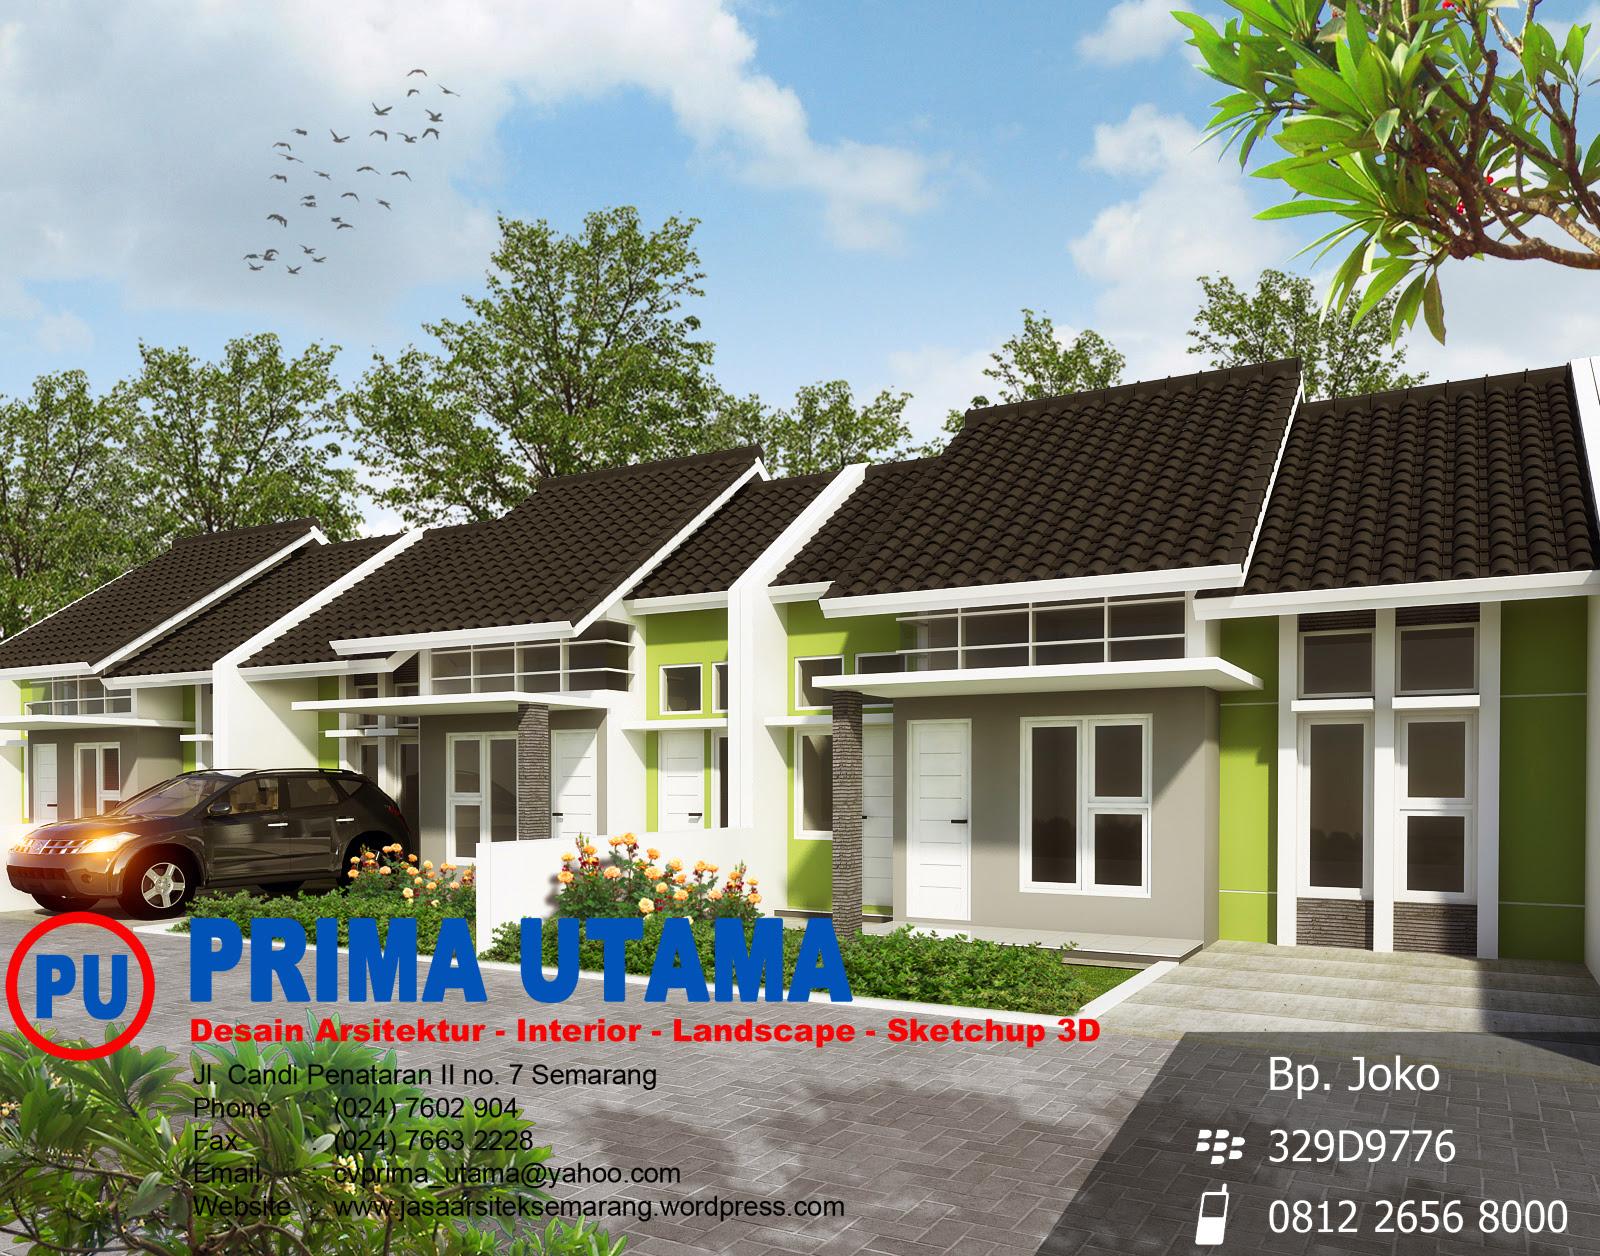 Harga Borongan Bangun Rumah Per M2 Di Jakarta Share The